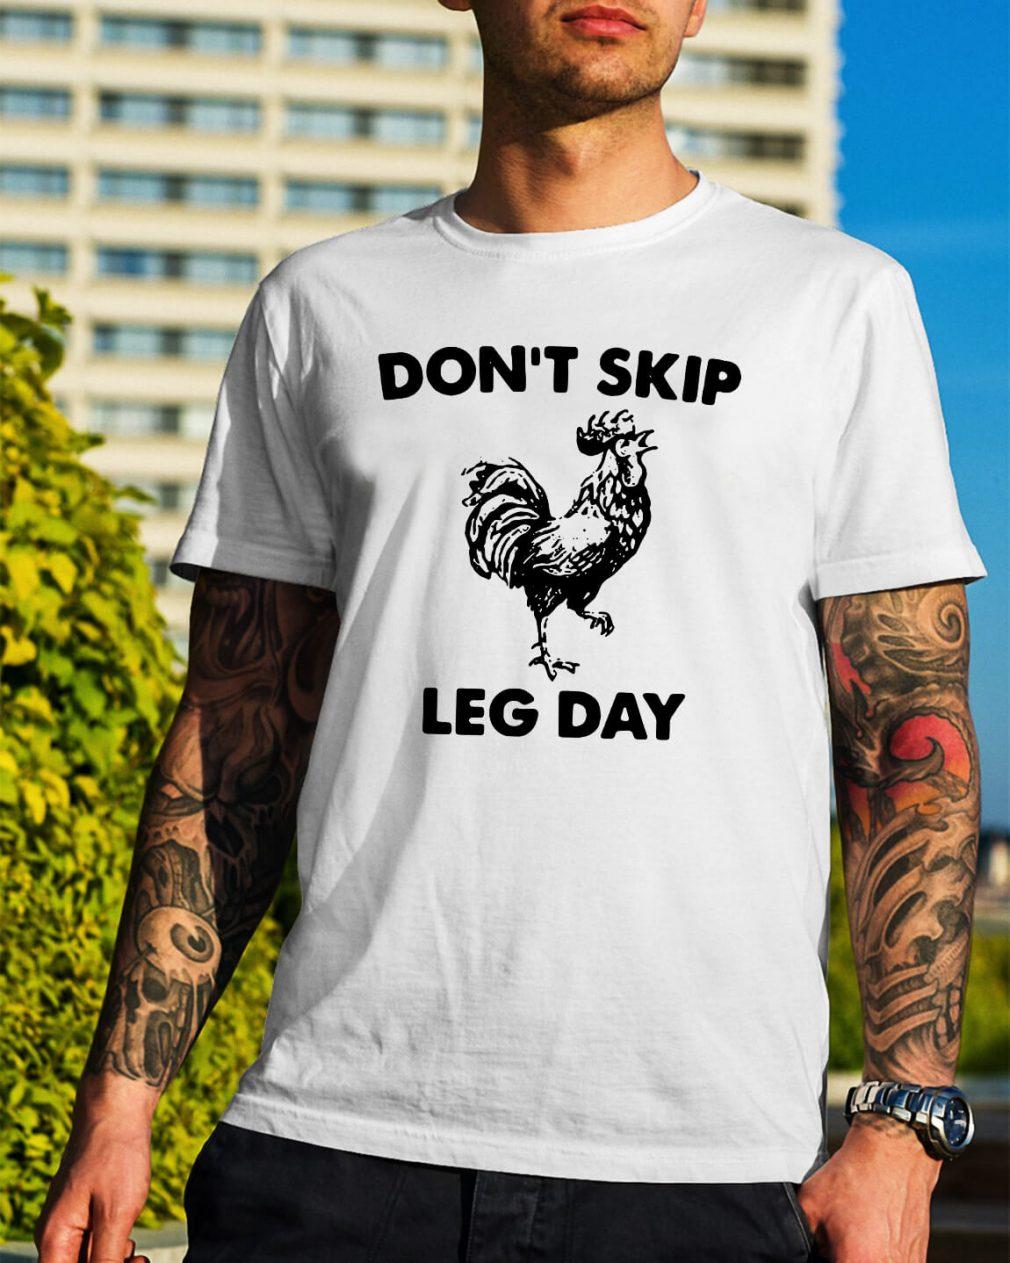 Don't skip leg day shirt